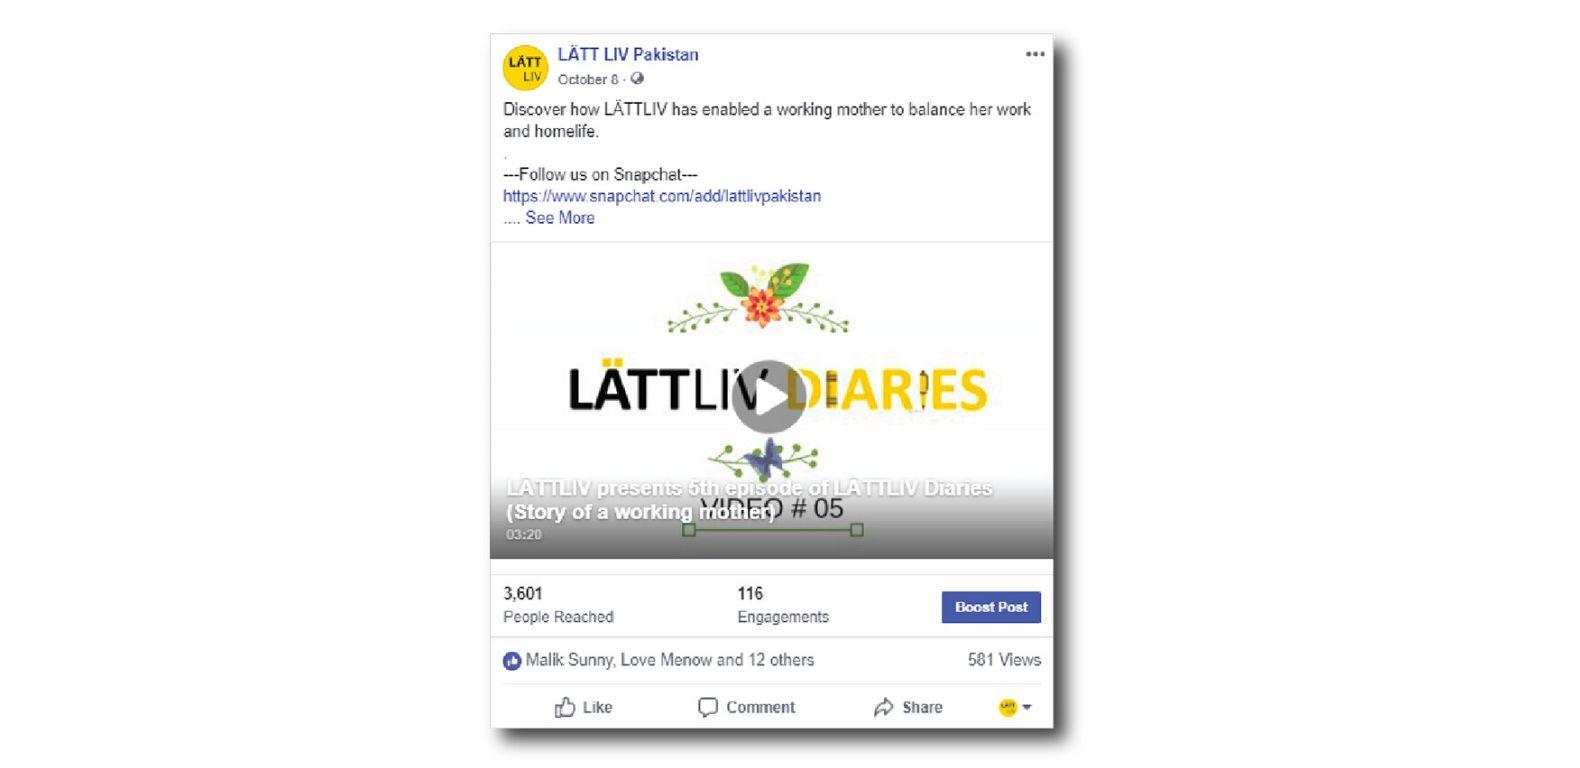 Lattliv-Pakistan-Social-media-marketing-management-Lattliv-Diaries-campaign